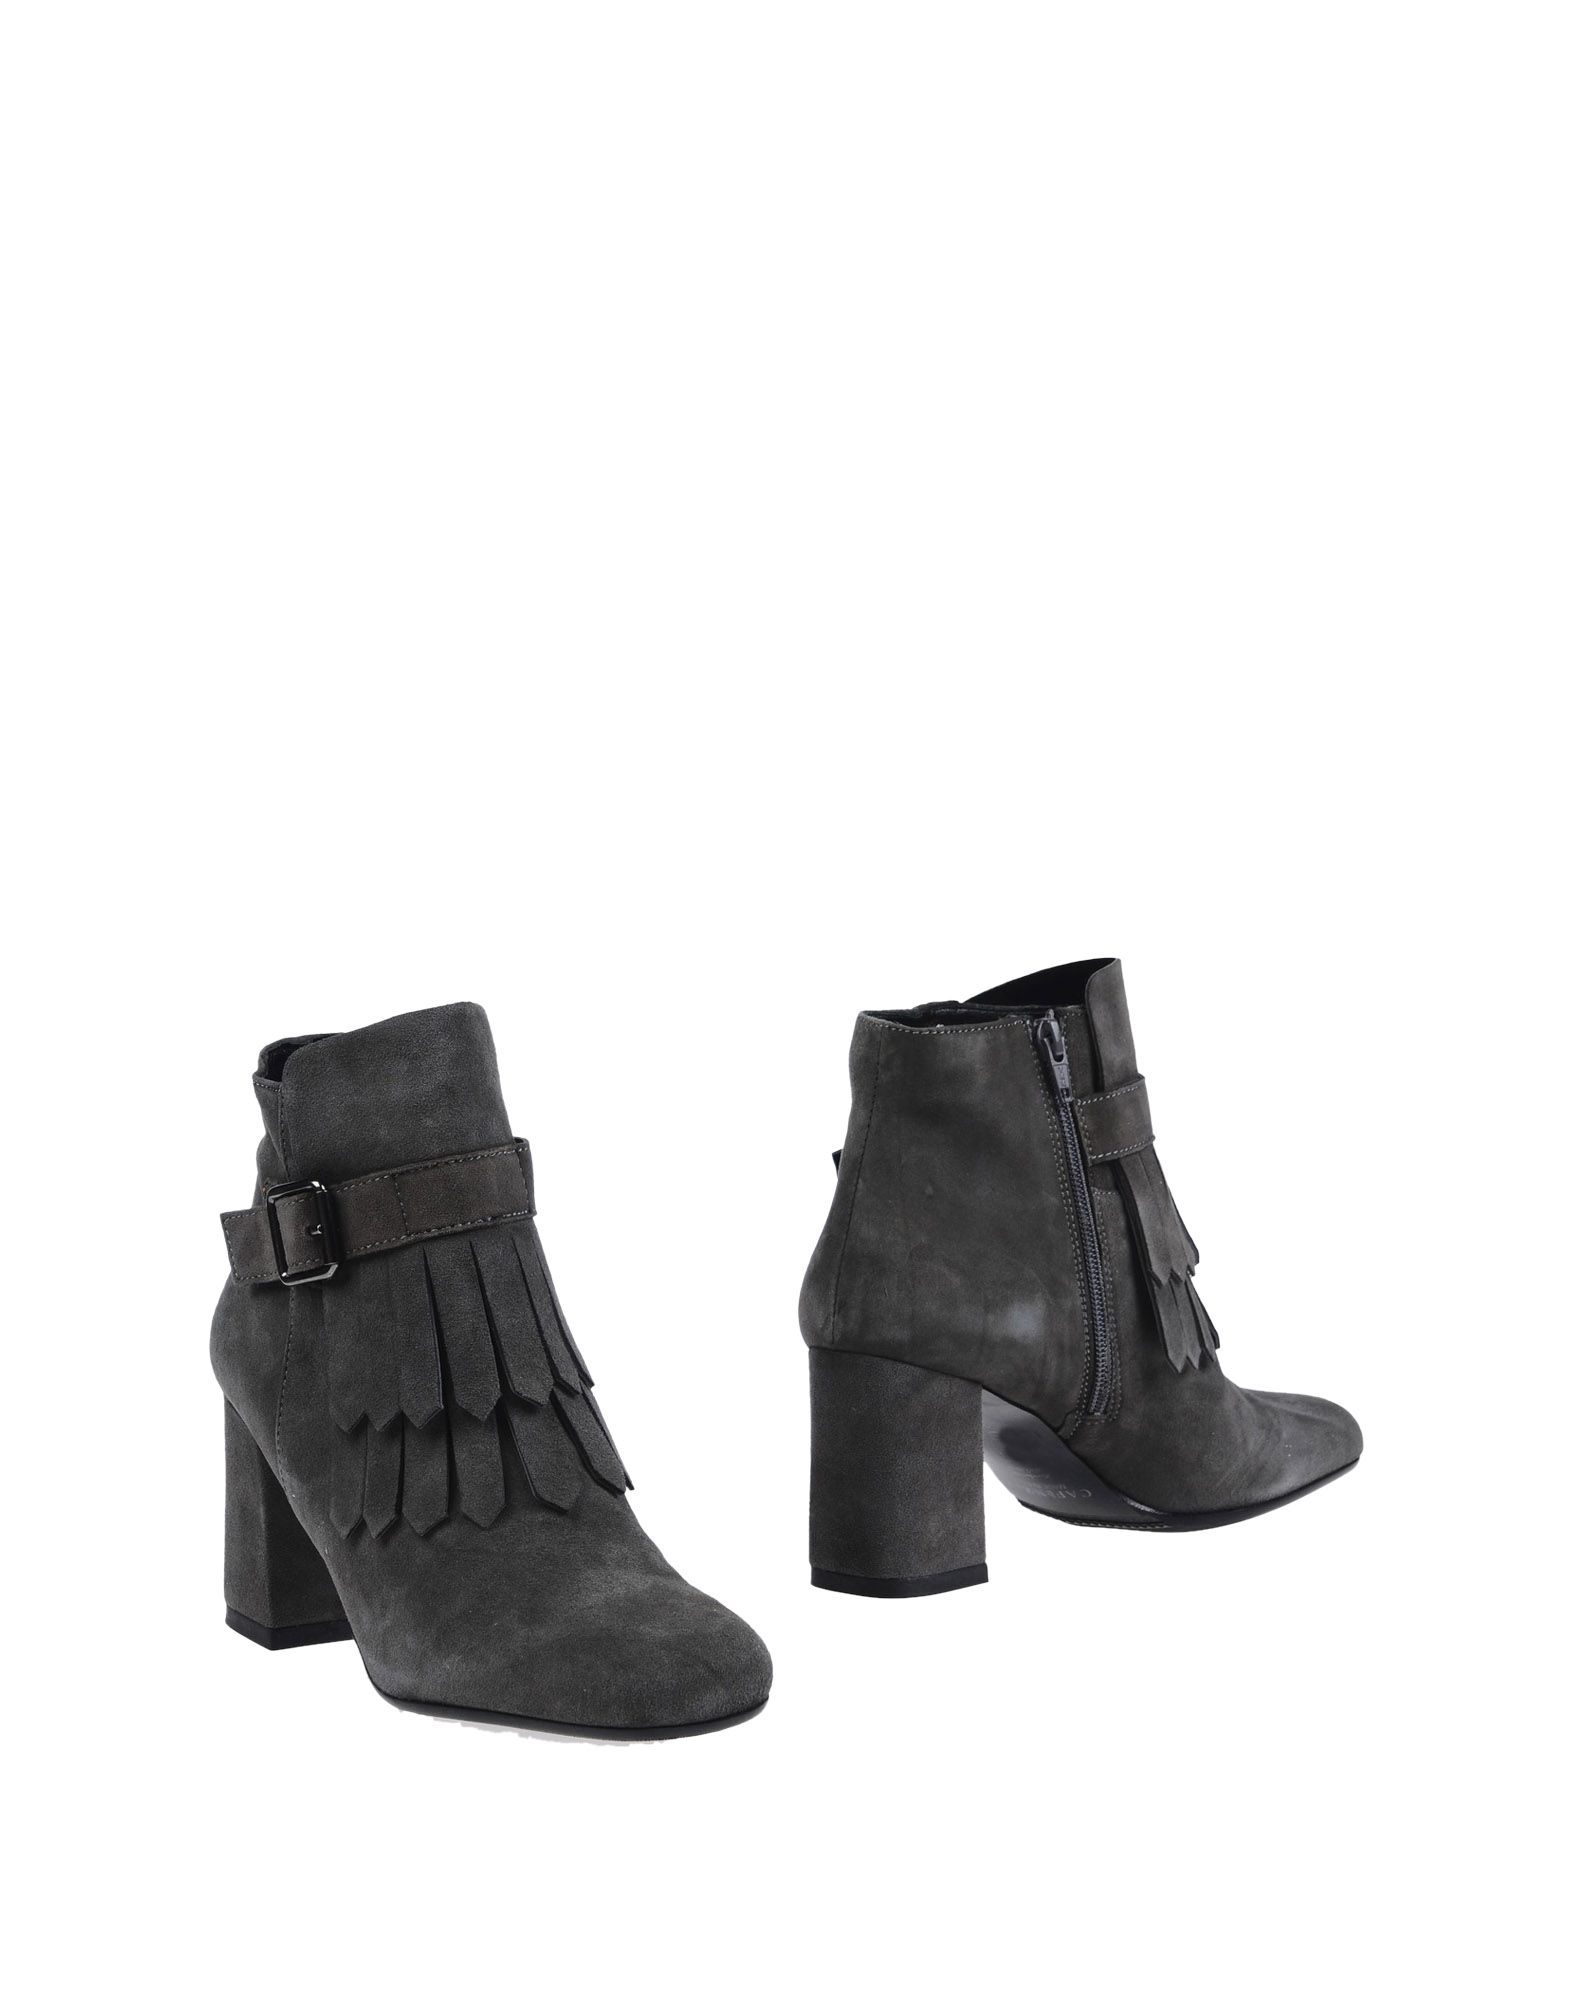 Cafènoir Stiefelette Damen Qualität  11252490HI Gute Qualität Damen beliebte Schuhe eef026